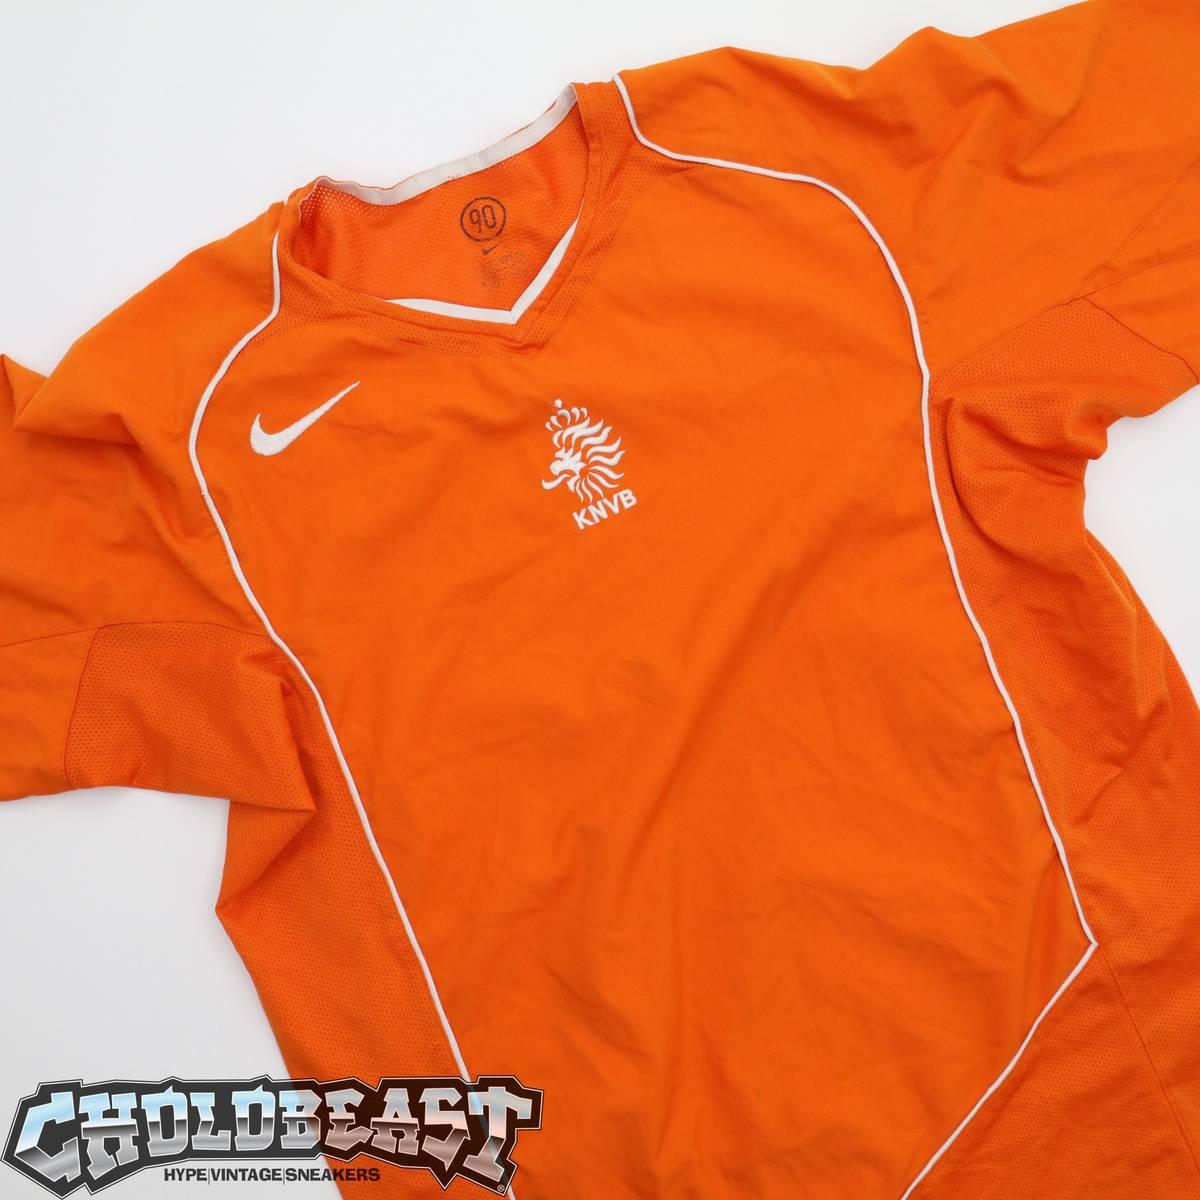 edb067d92 Nike Nike Netherlands 2004 2006 Home Jersey World Cup Fifa Futbol Soccer  Jersey Size l - Jerseys for Sale - Grailed